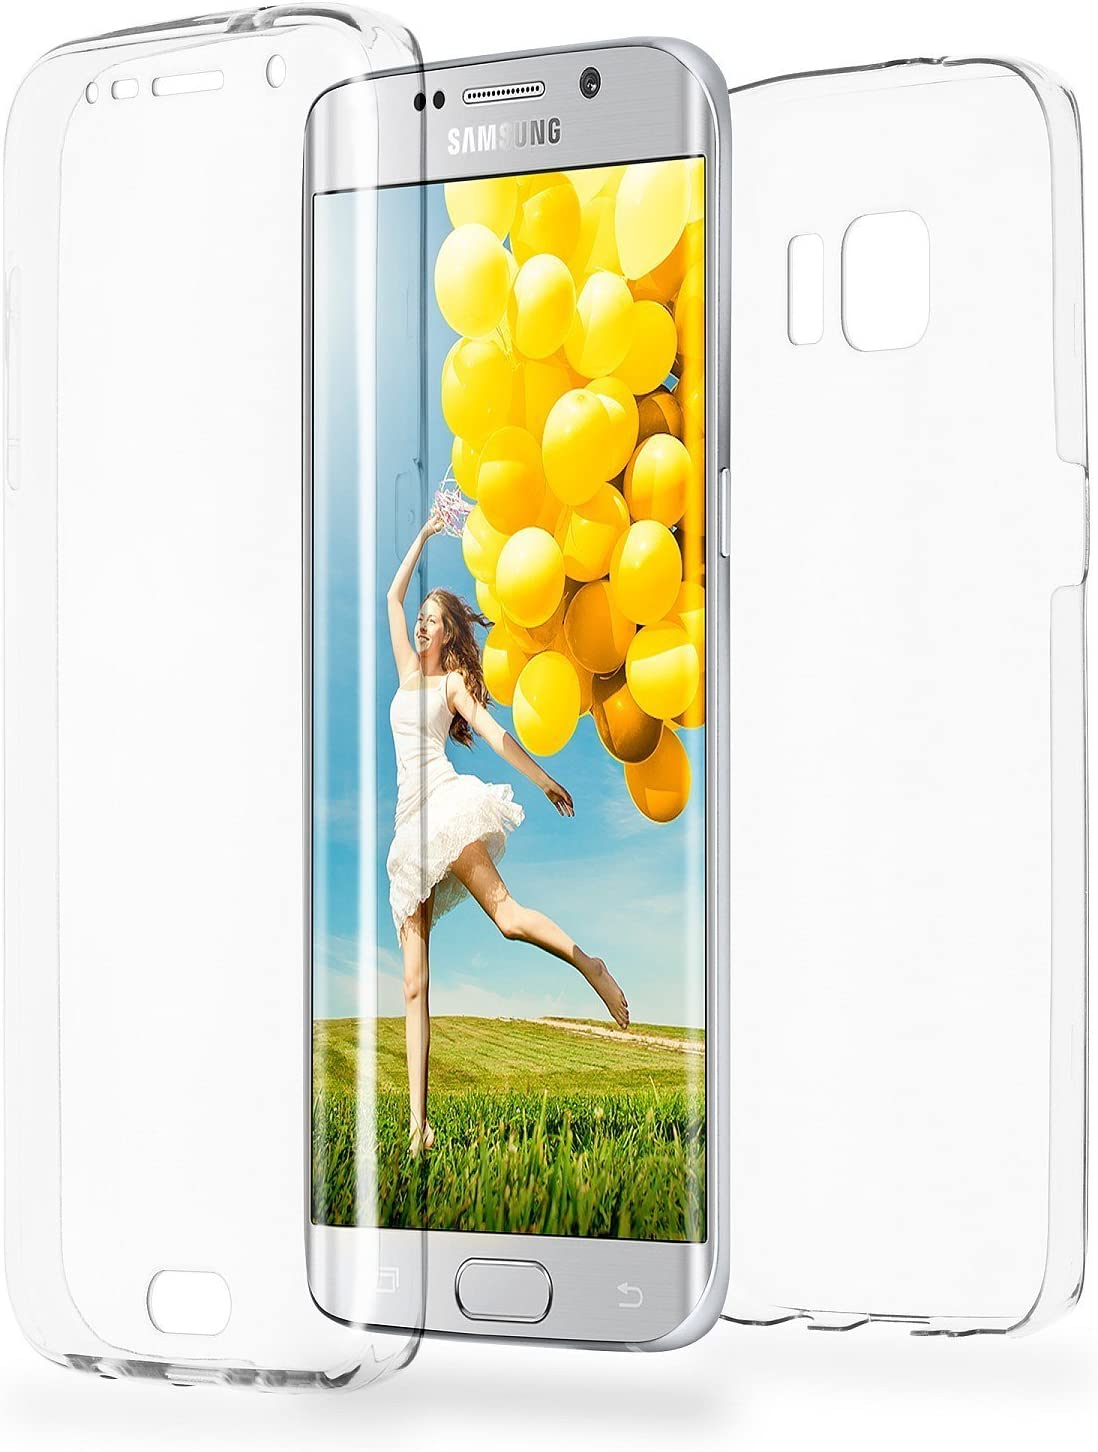 COPHONE® Funda Samsung Galaxy S6 Edge, Transparente Silicona 360°Full Body Fundas para Samsung Galaxy S6 Edge Carcasa Silicona Funda Case.